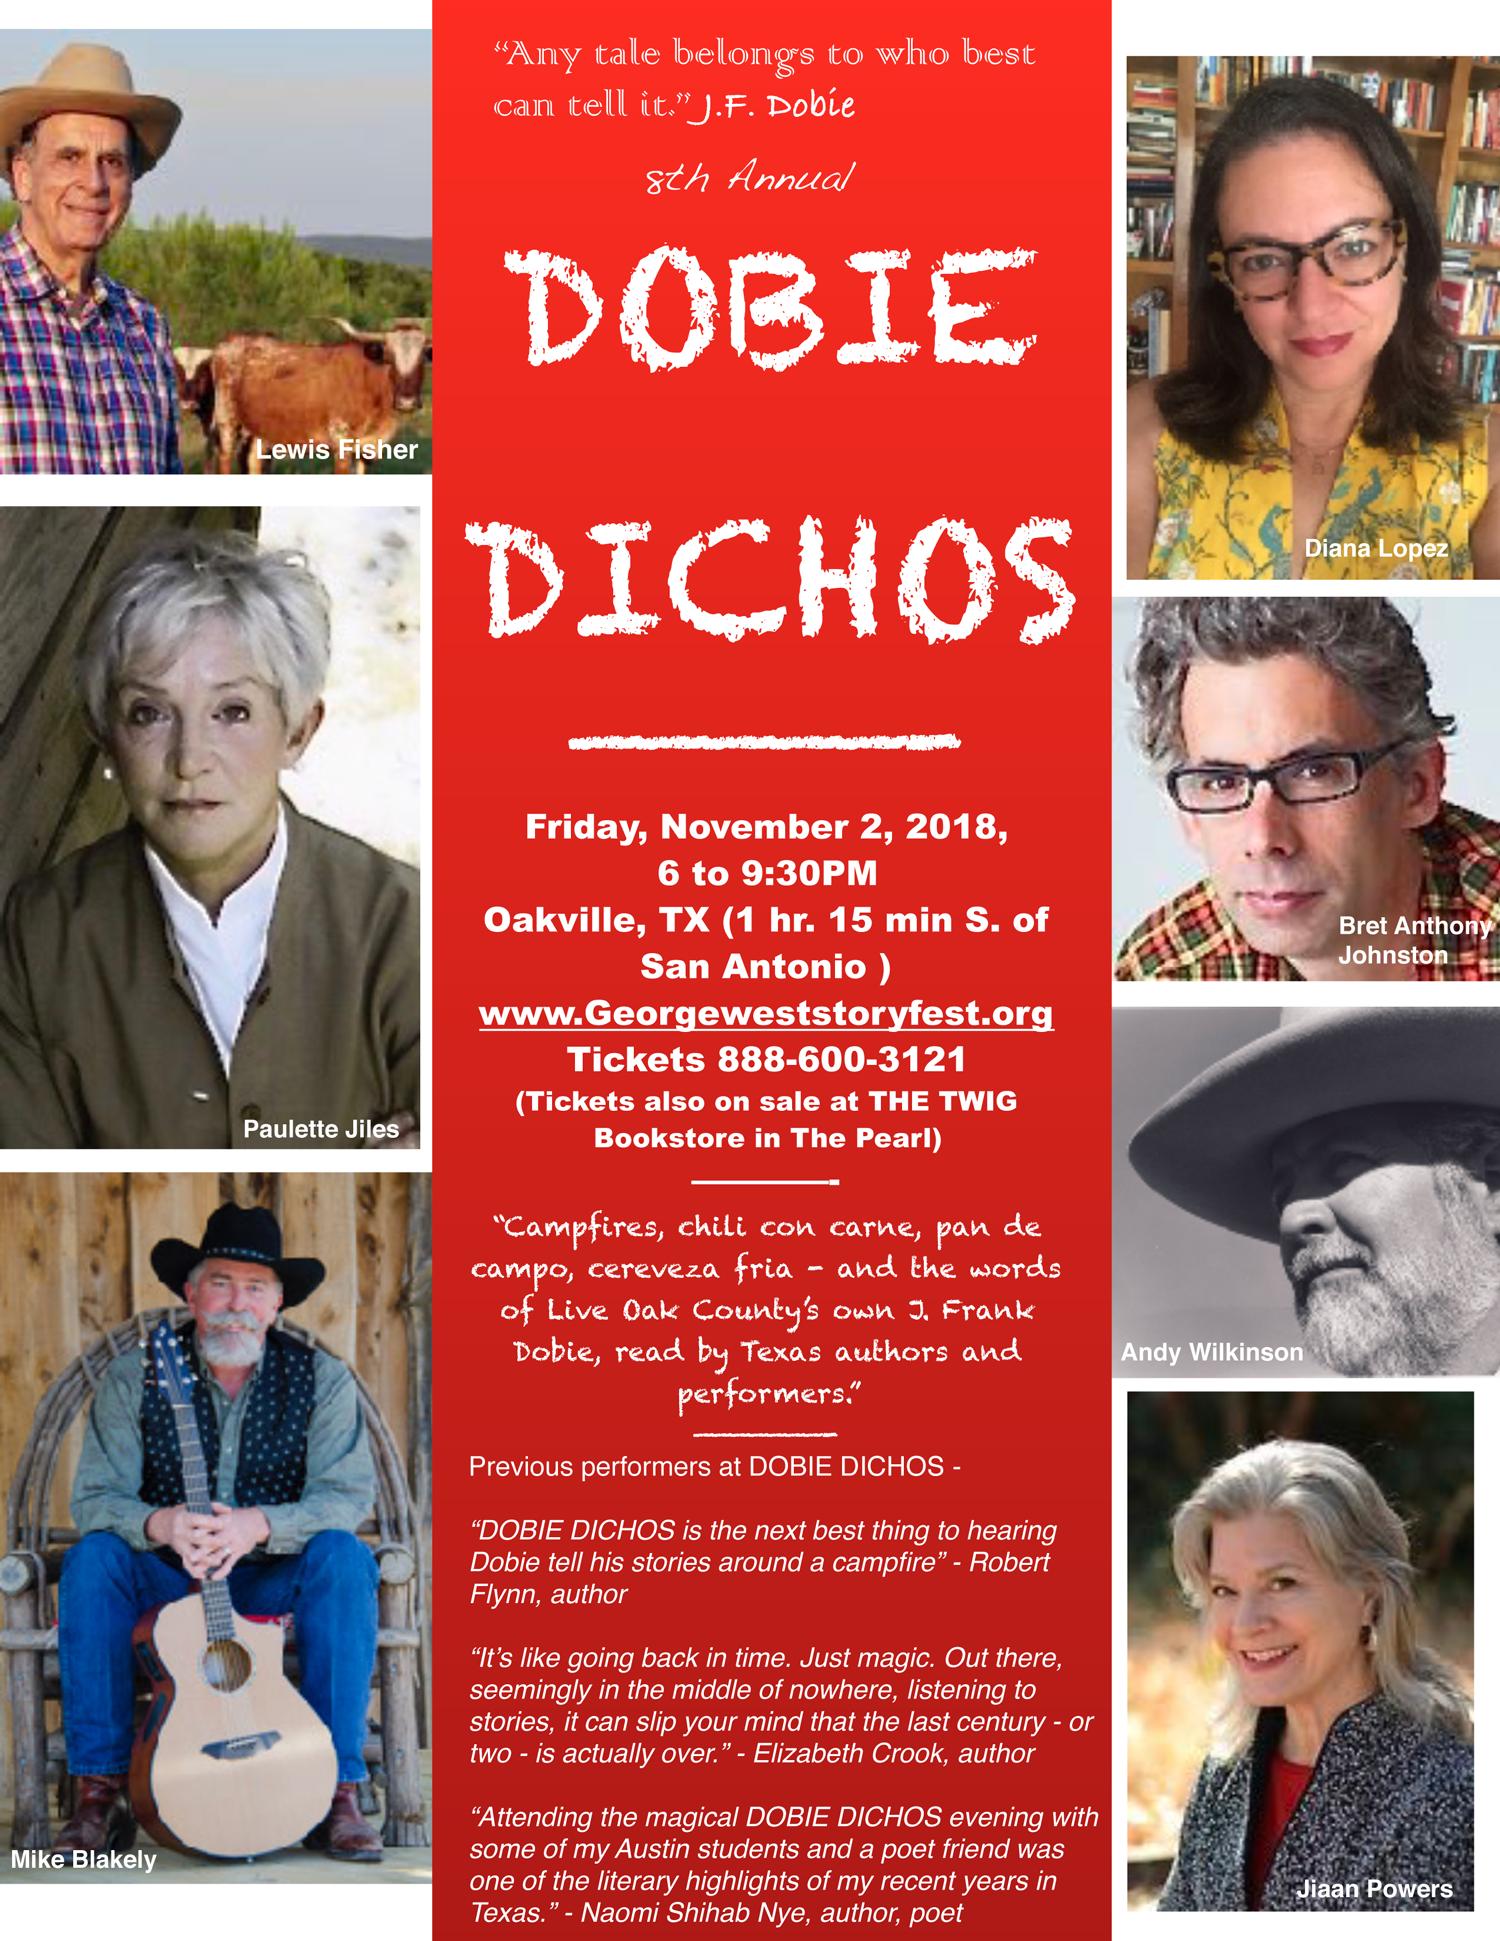 Dobie-Dichos-2018-poster.png